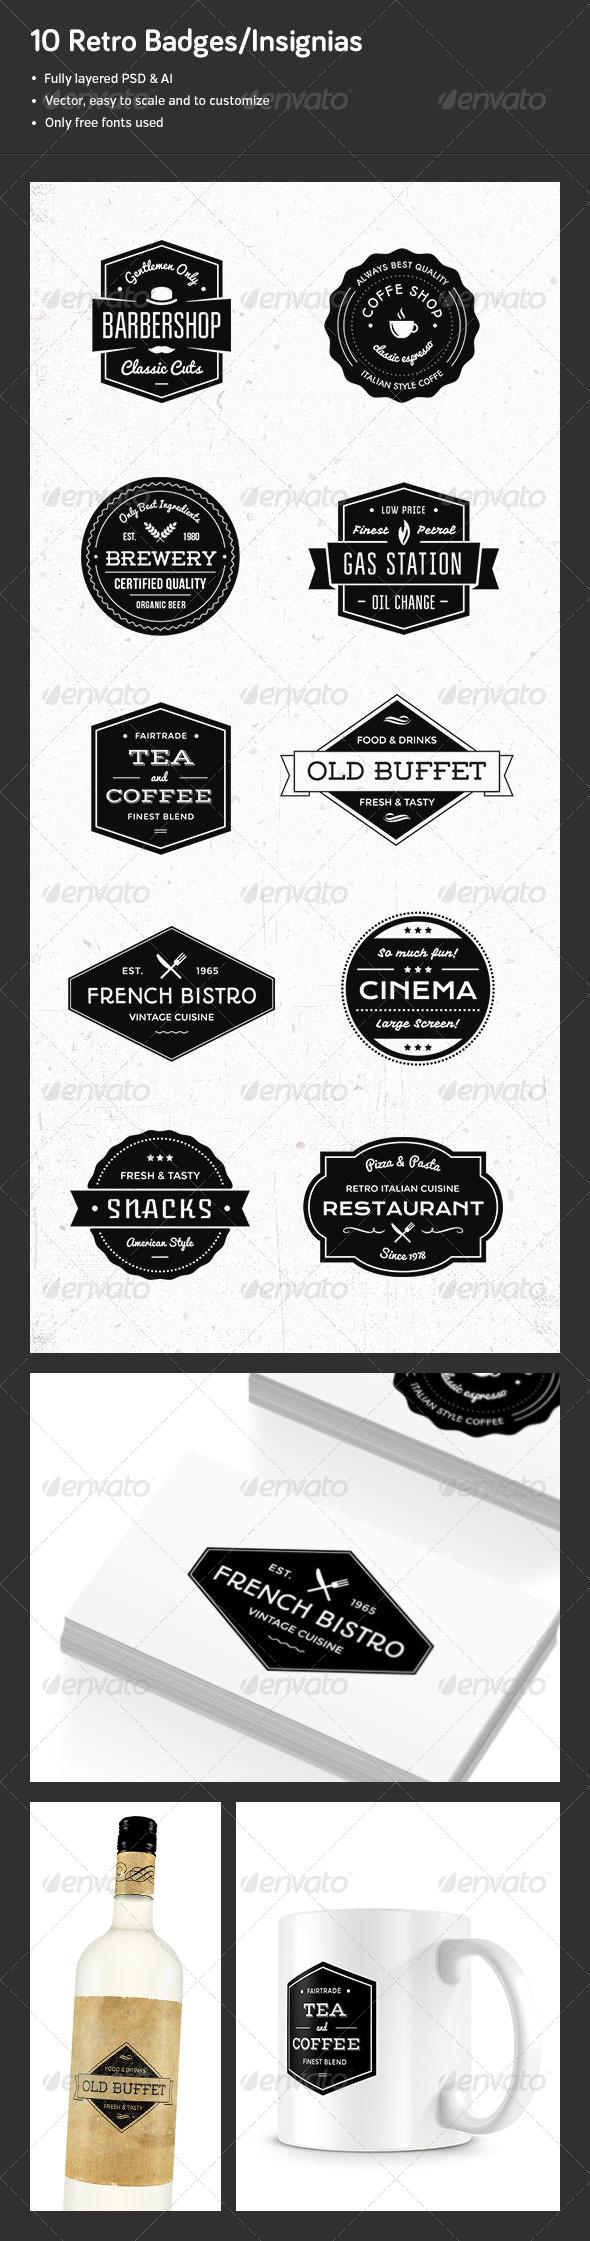 10 Retro Badges/Insignias - Badges & Stickers Web Elements